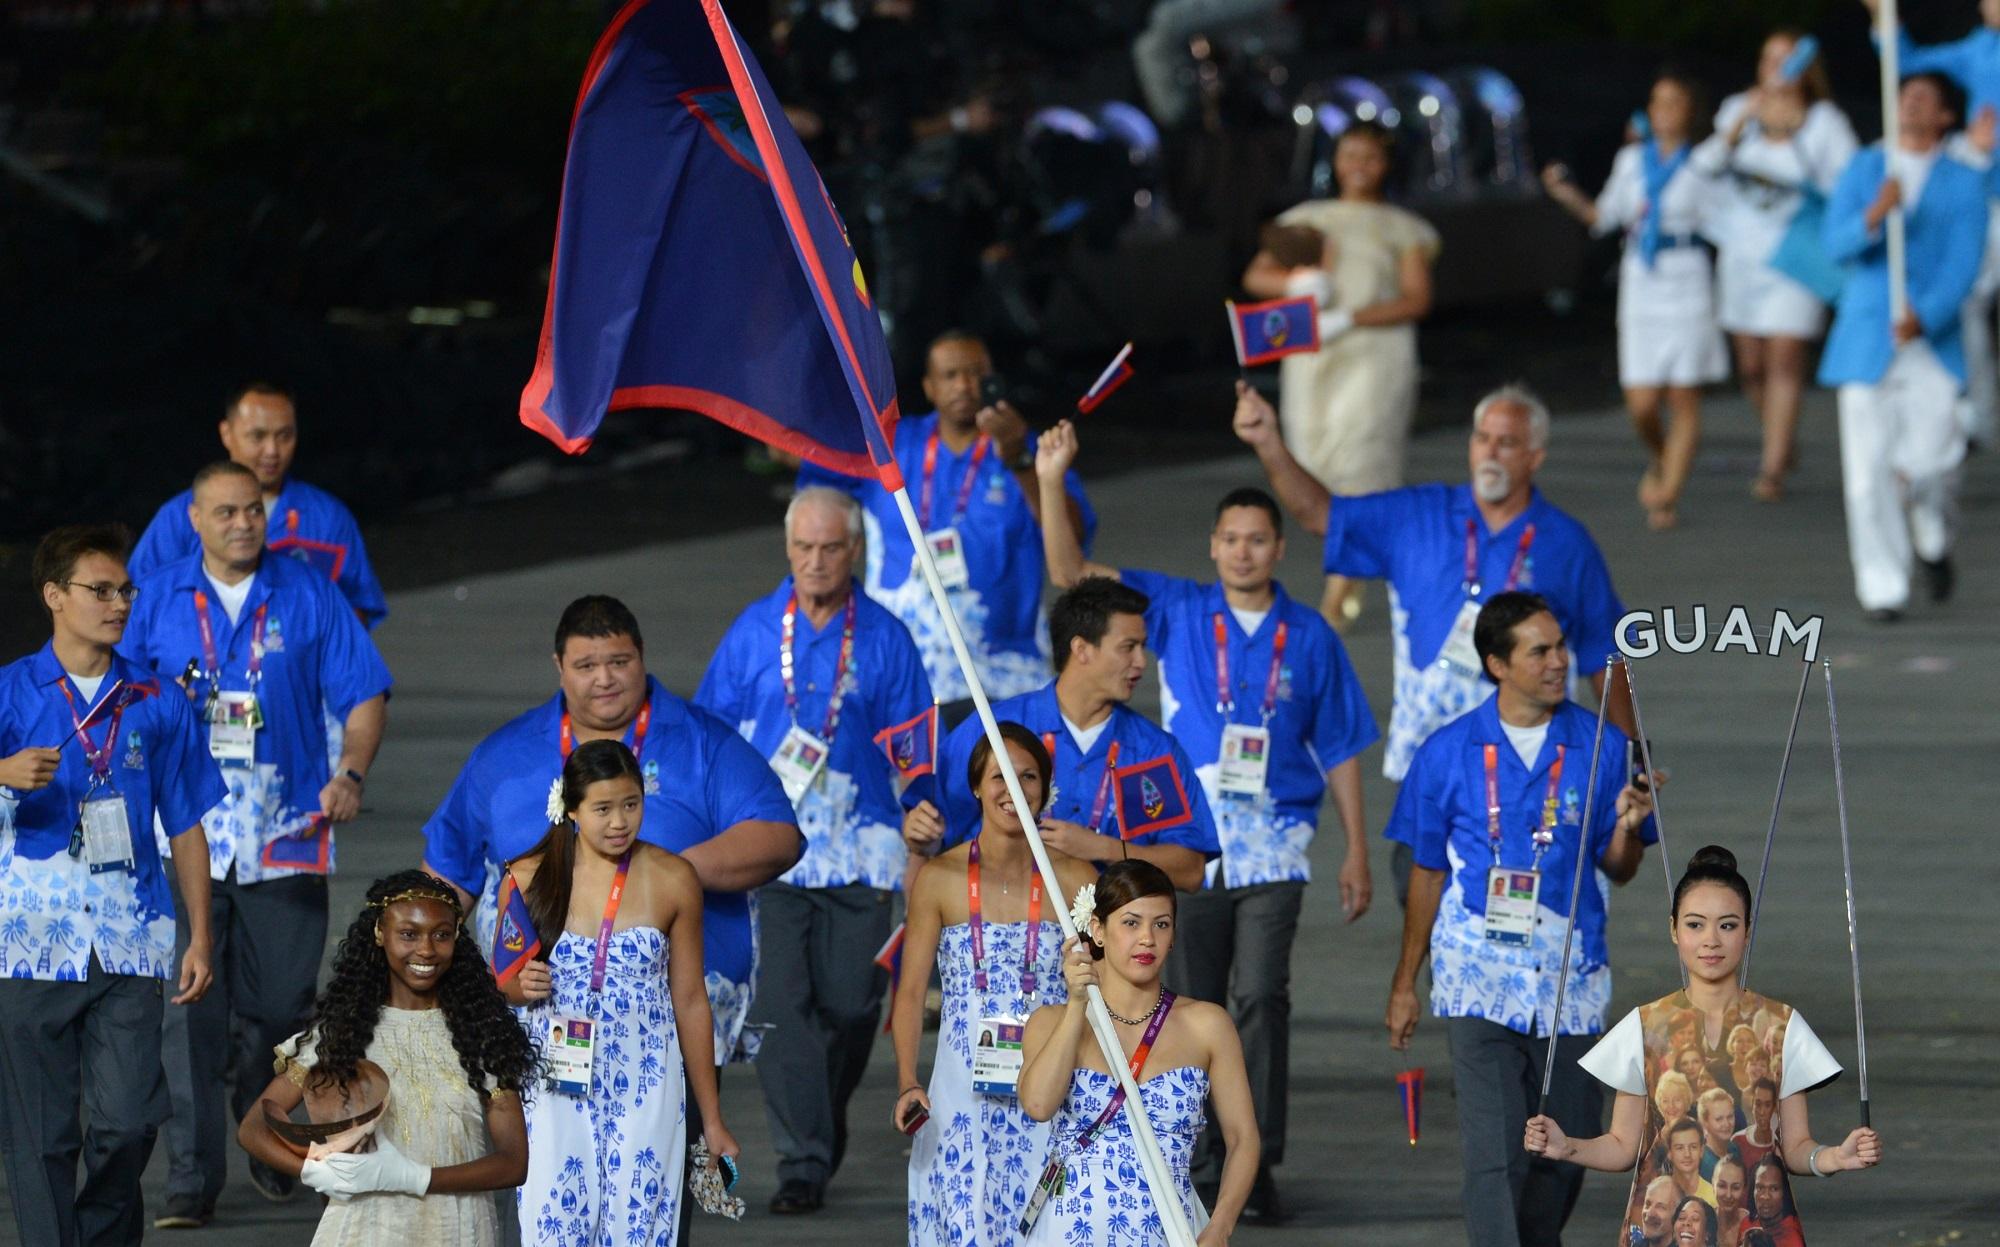 Guam Olympic team Getty Images/Gabriel Bouys